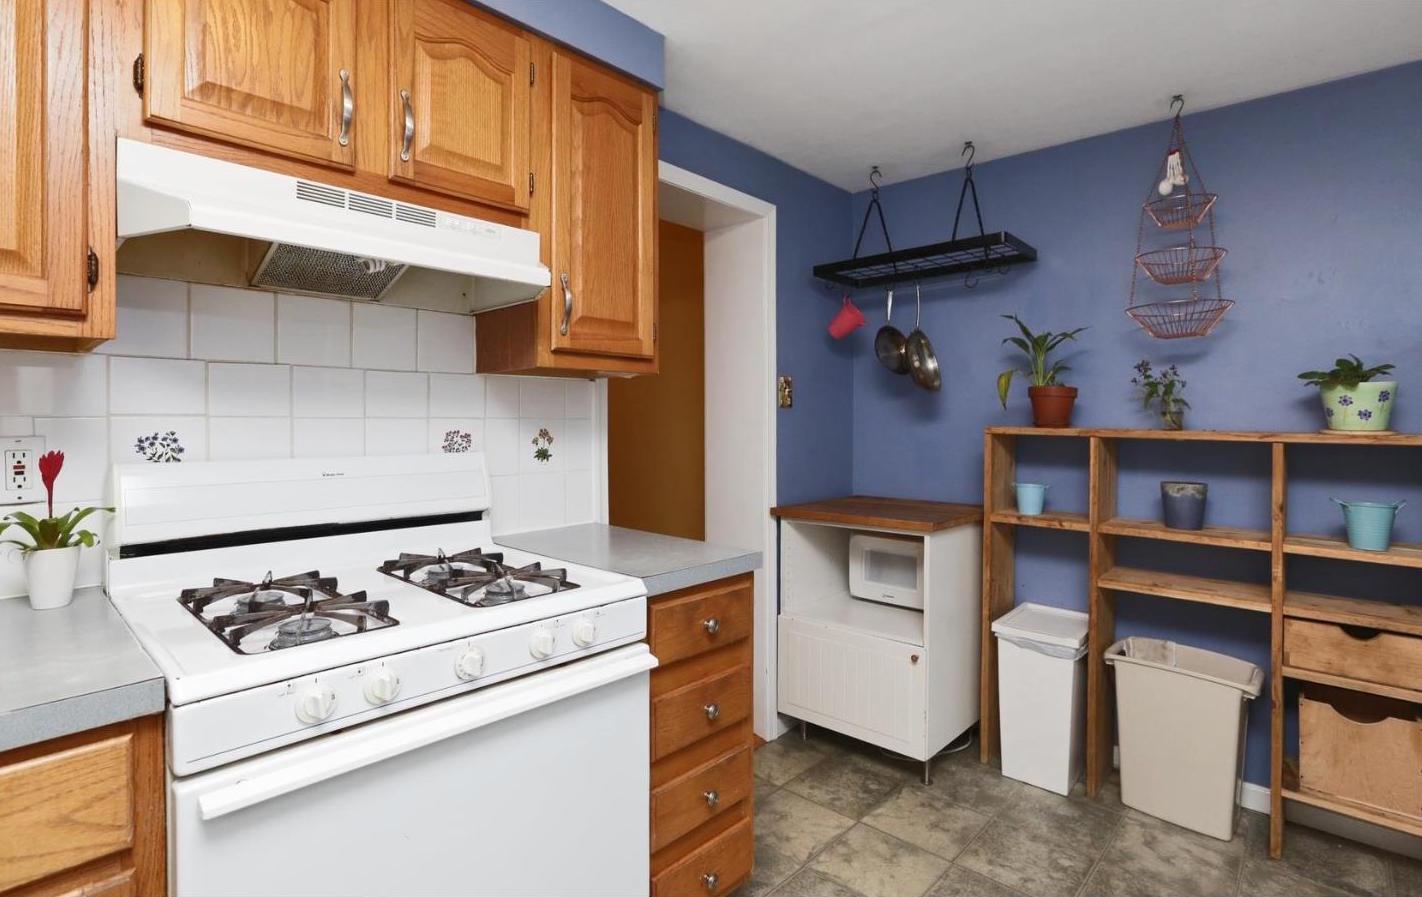 lawnton kitchen 2.jpeg